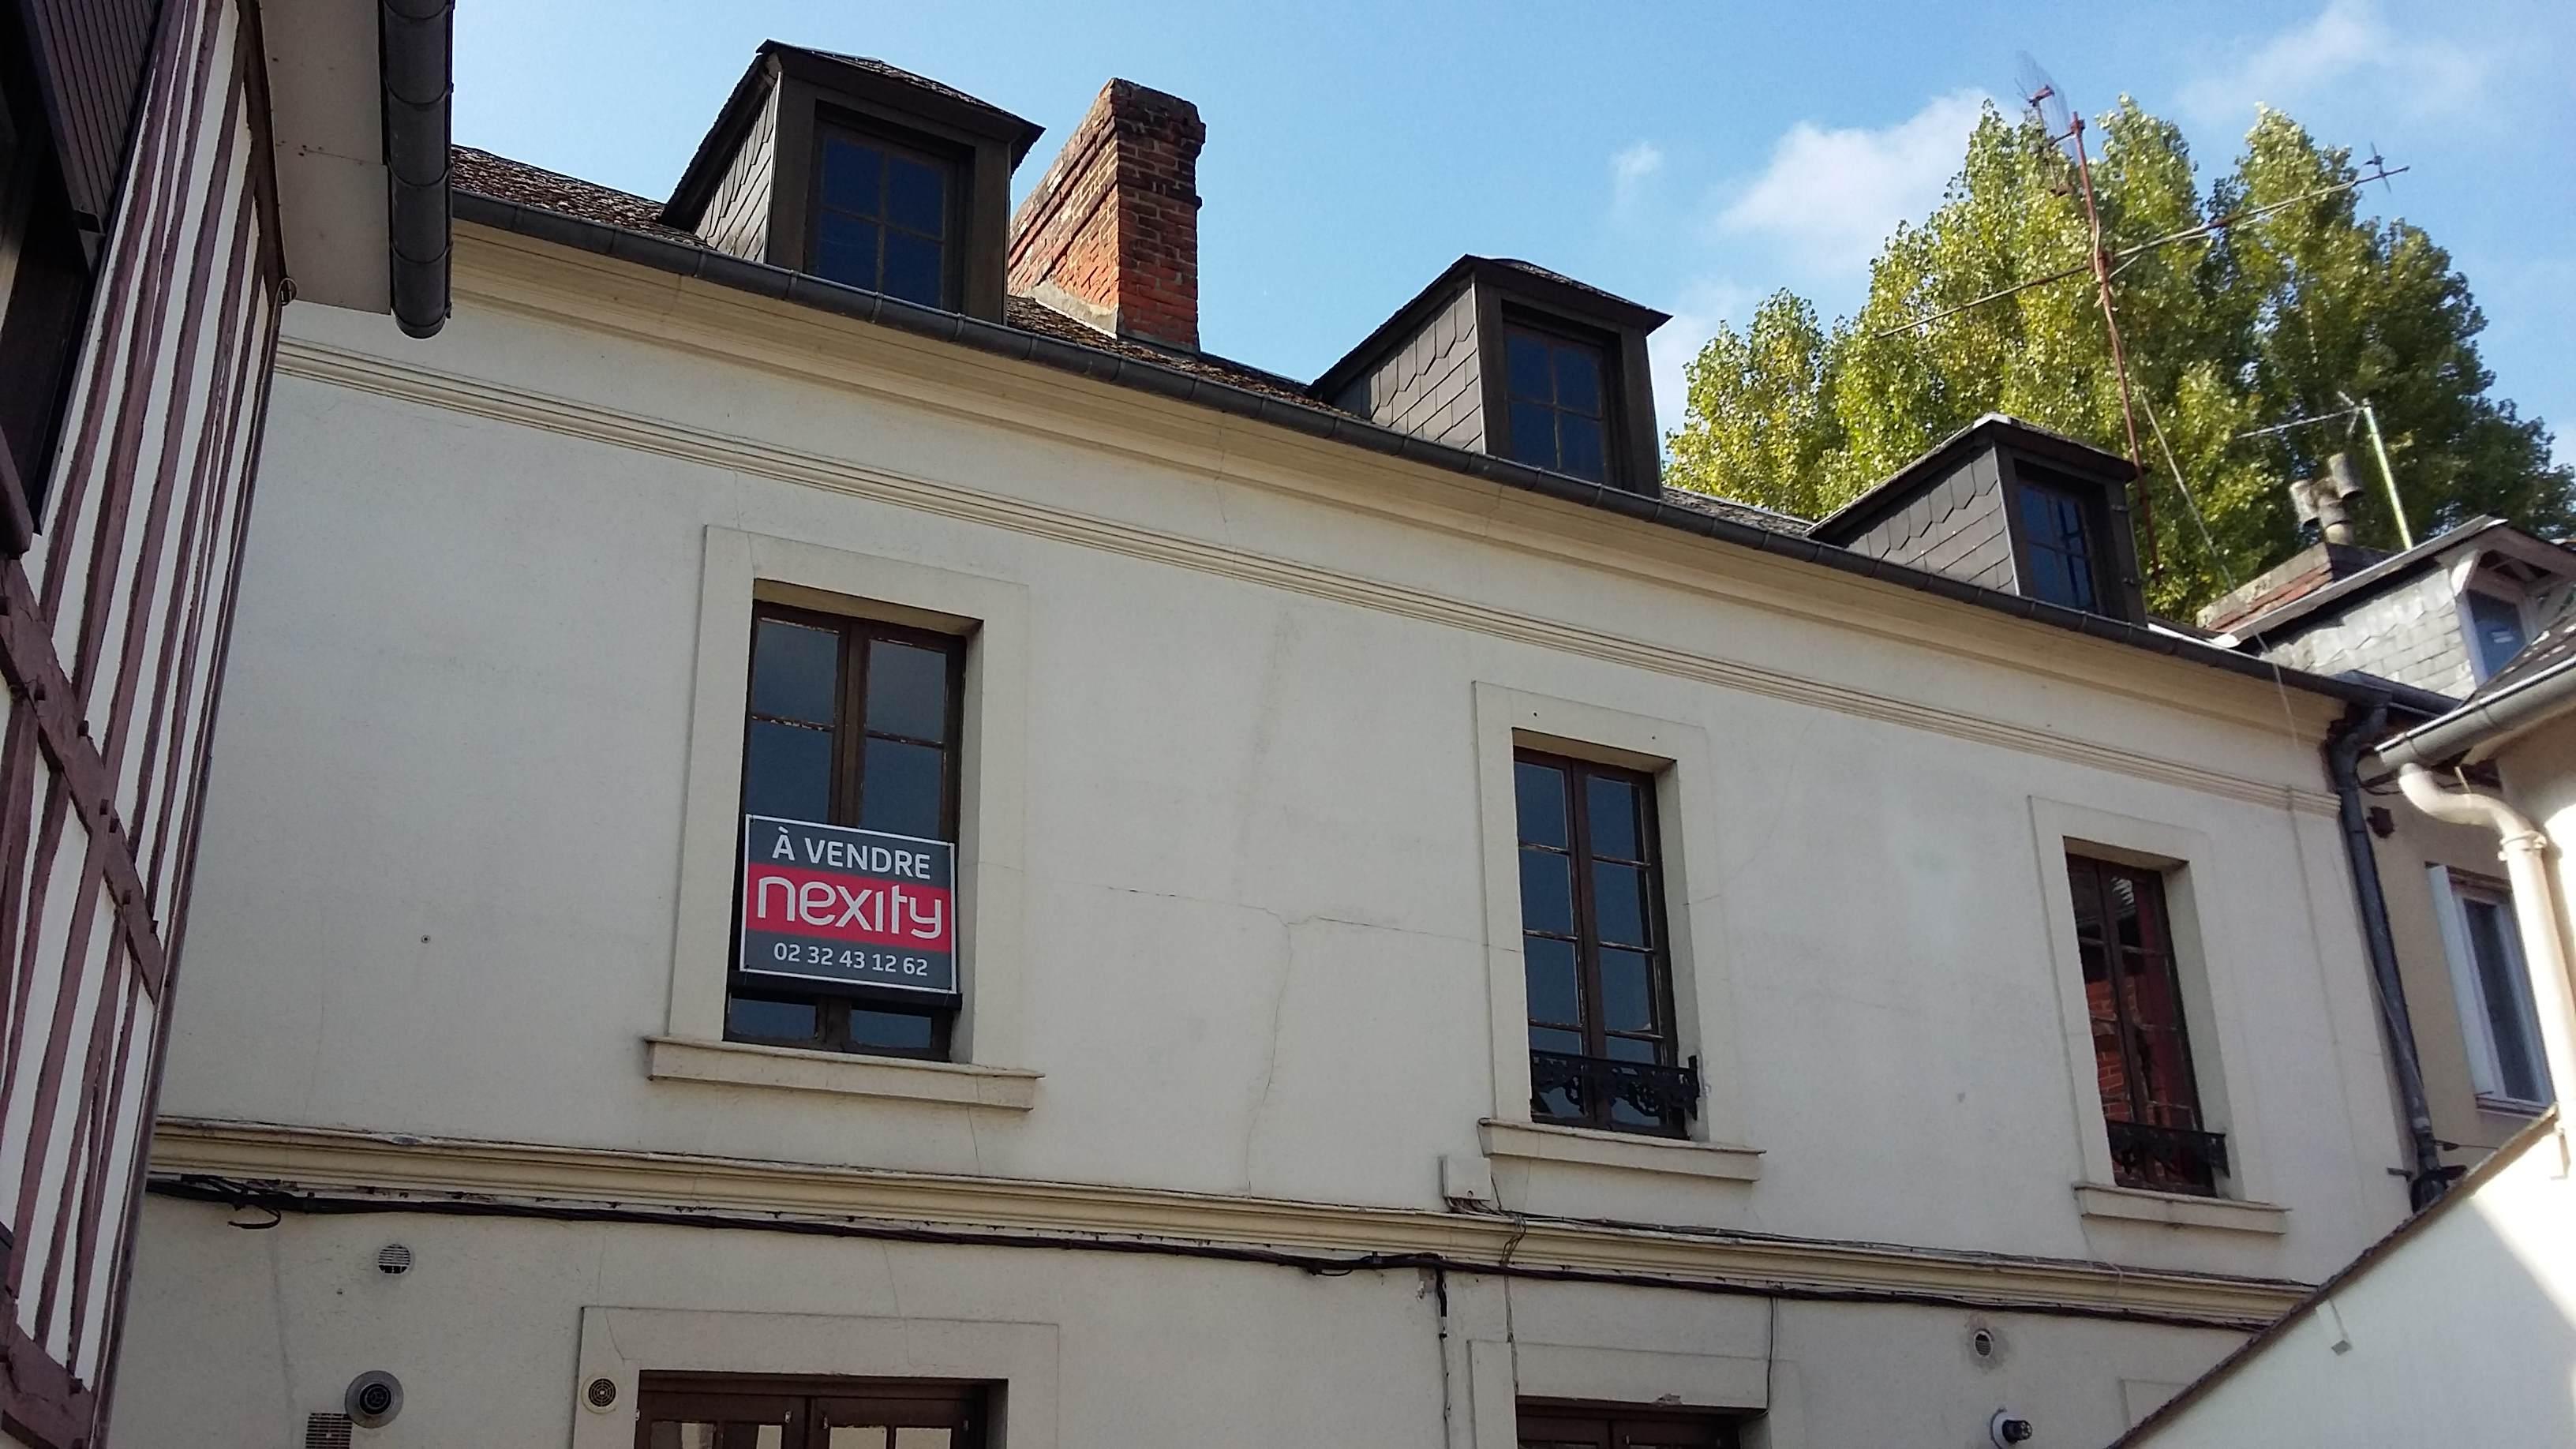 Achat-Vente-Immeuble-Haute-Normandie-EURE-Bernay